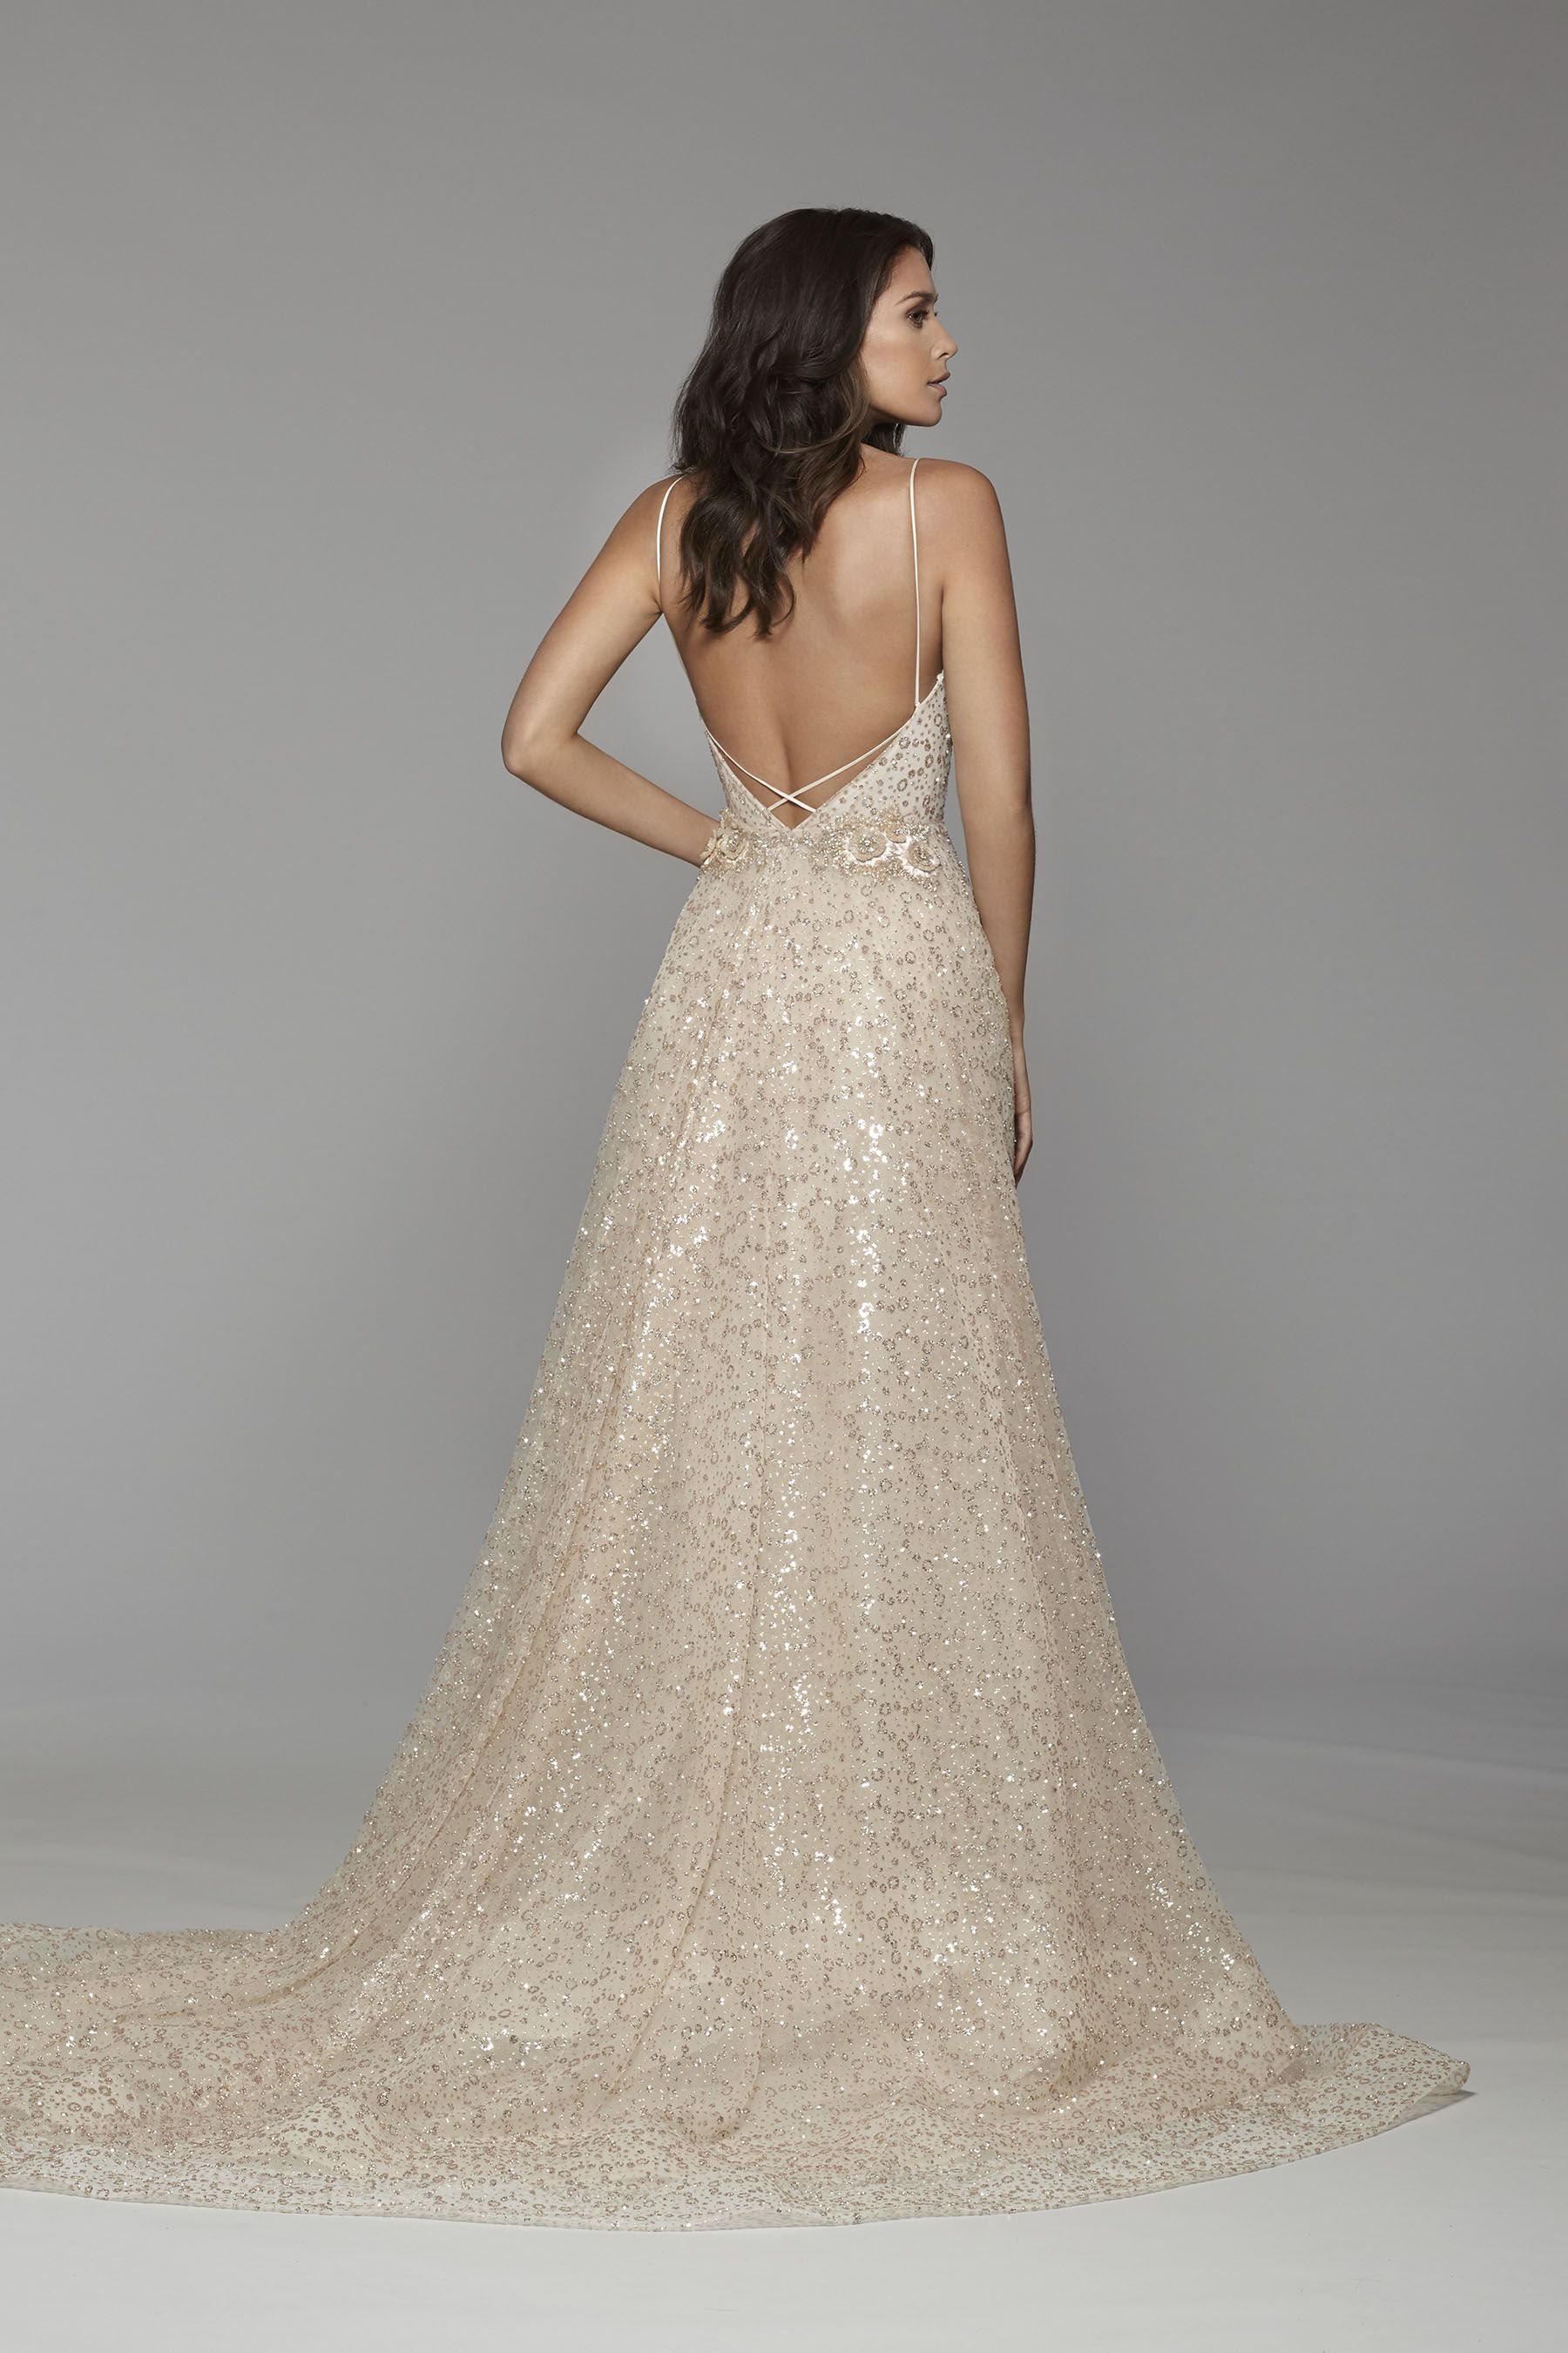 Tara Keely Bridal Style 2750 - Rose gold glitter encrusted sparkle ...